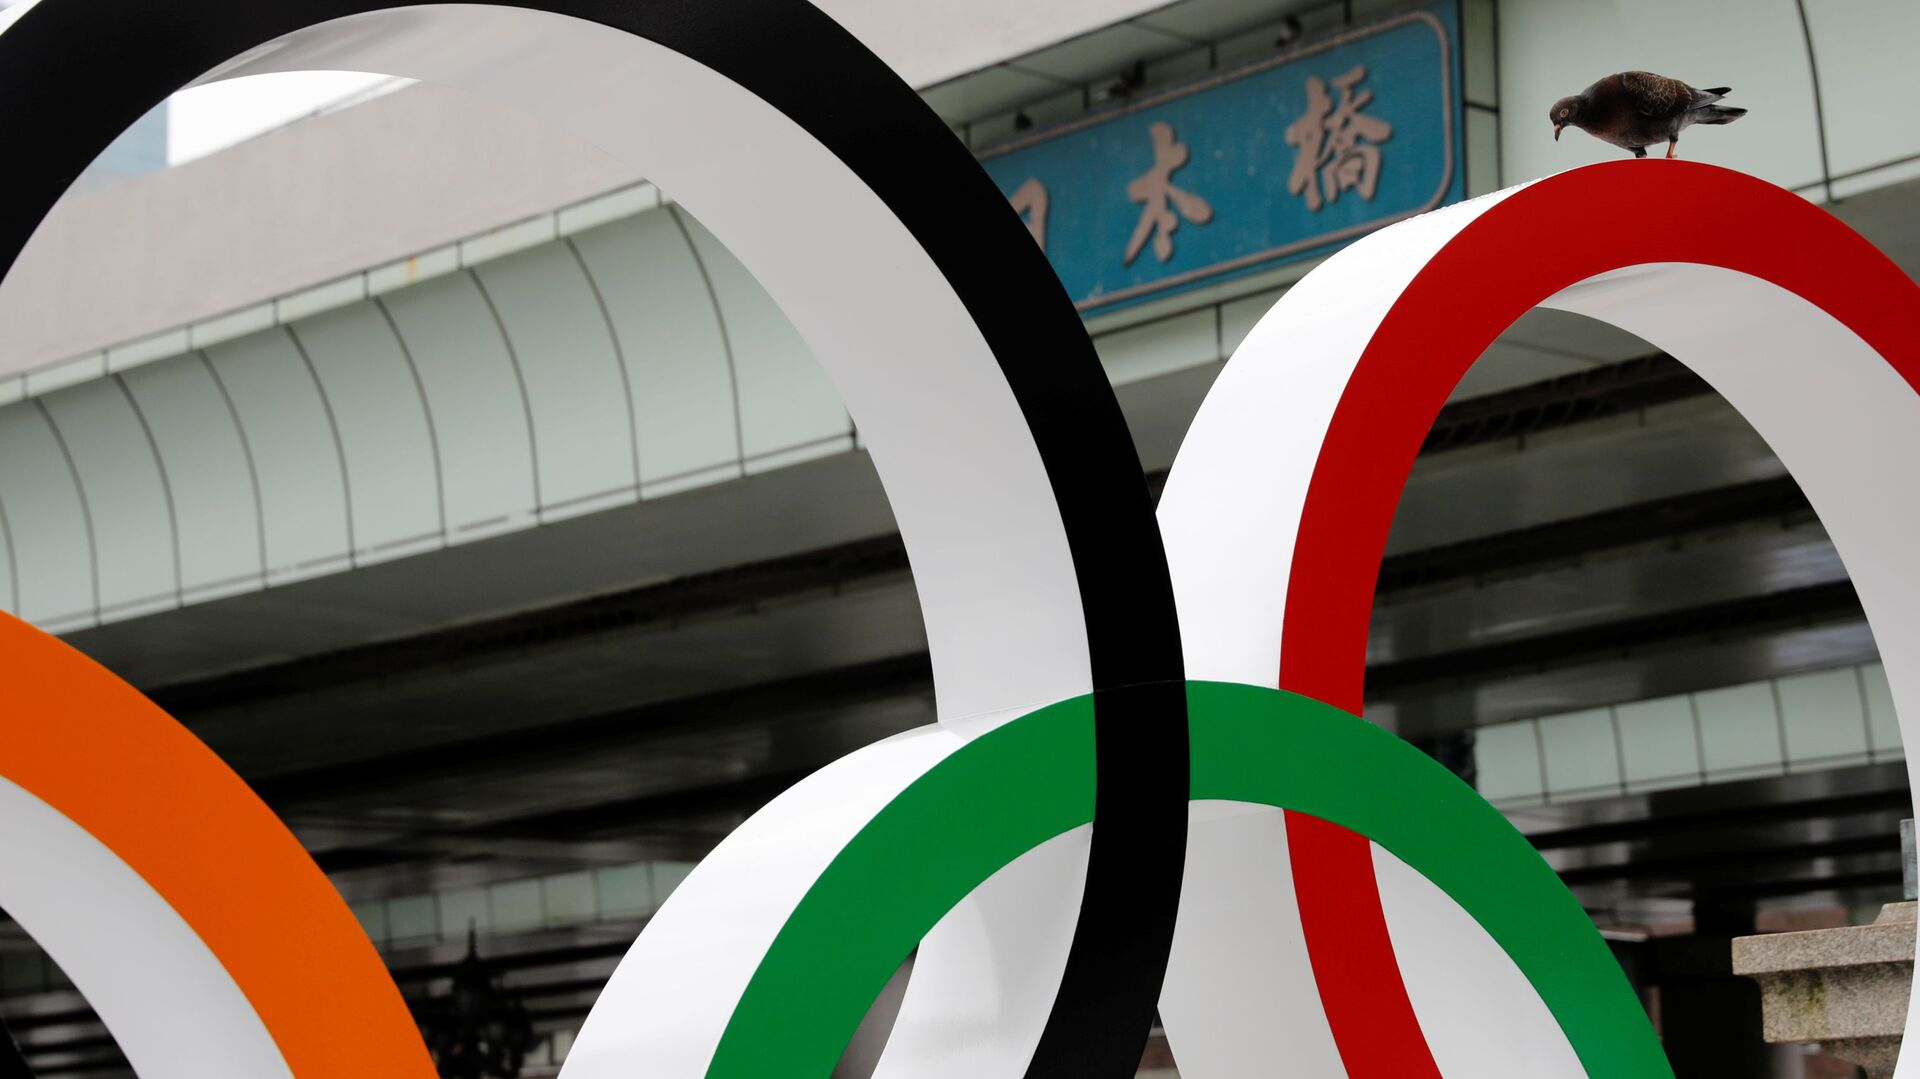 Голубь на Олимпийских кольцах в Токио  - Sputnik Italia, 1920, 18.07.2021